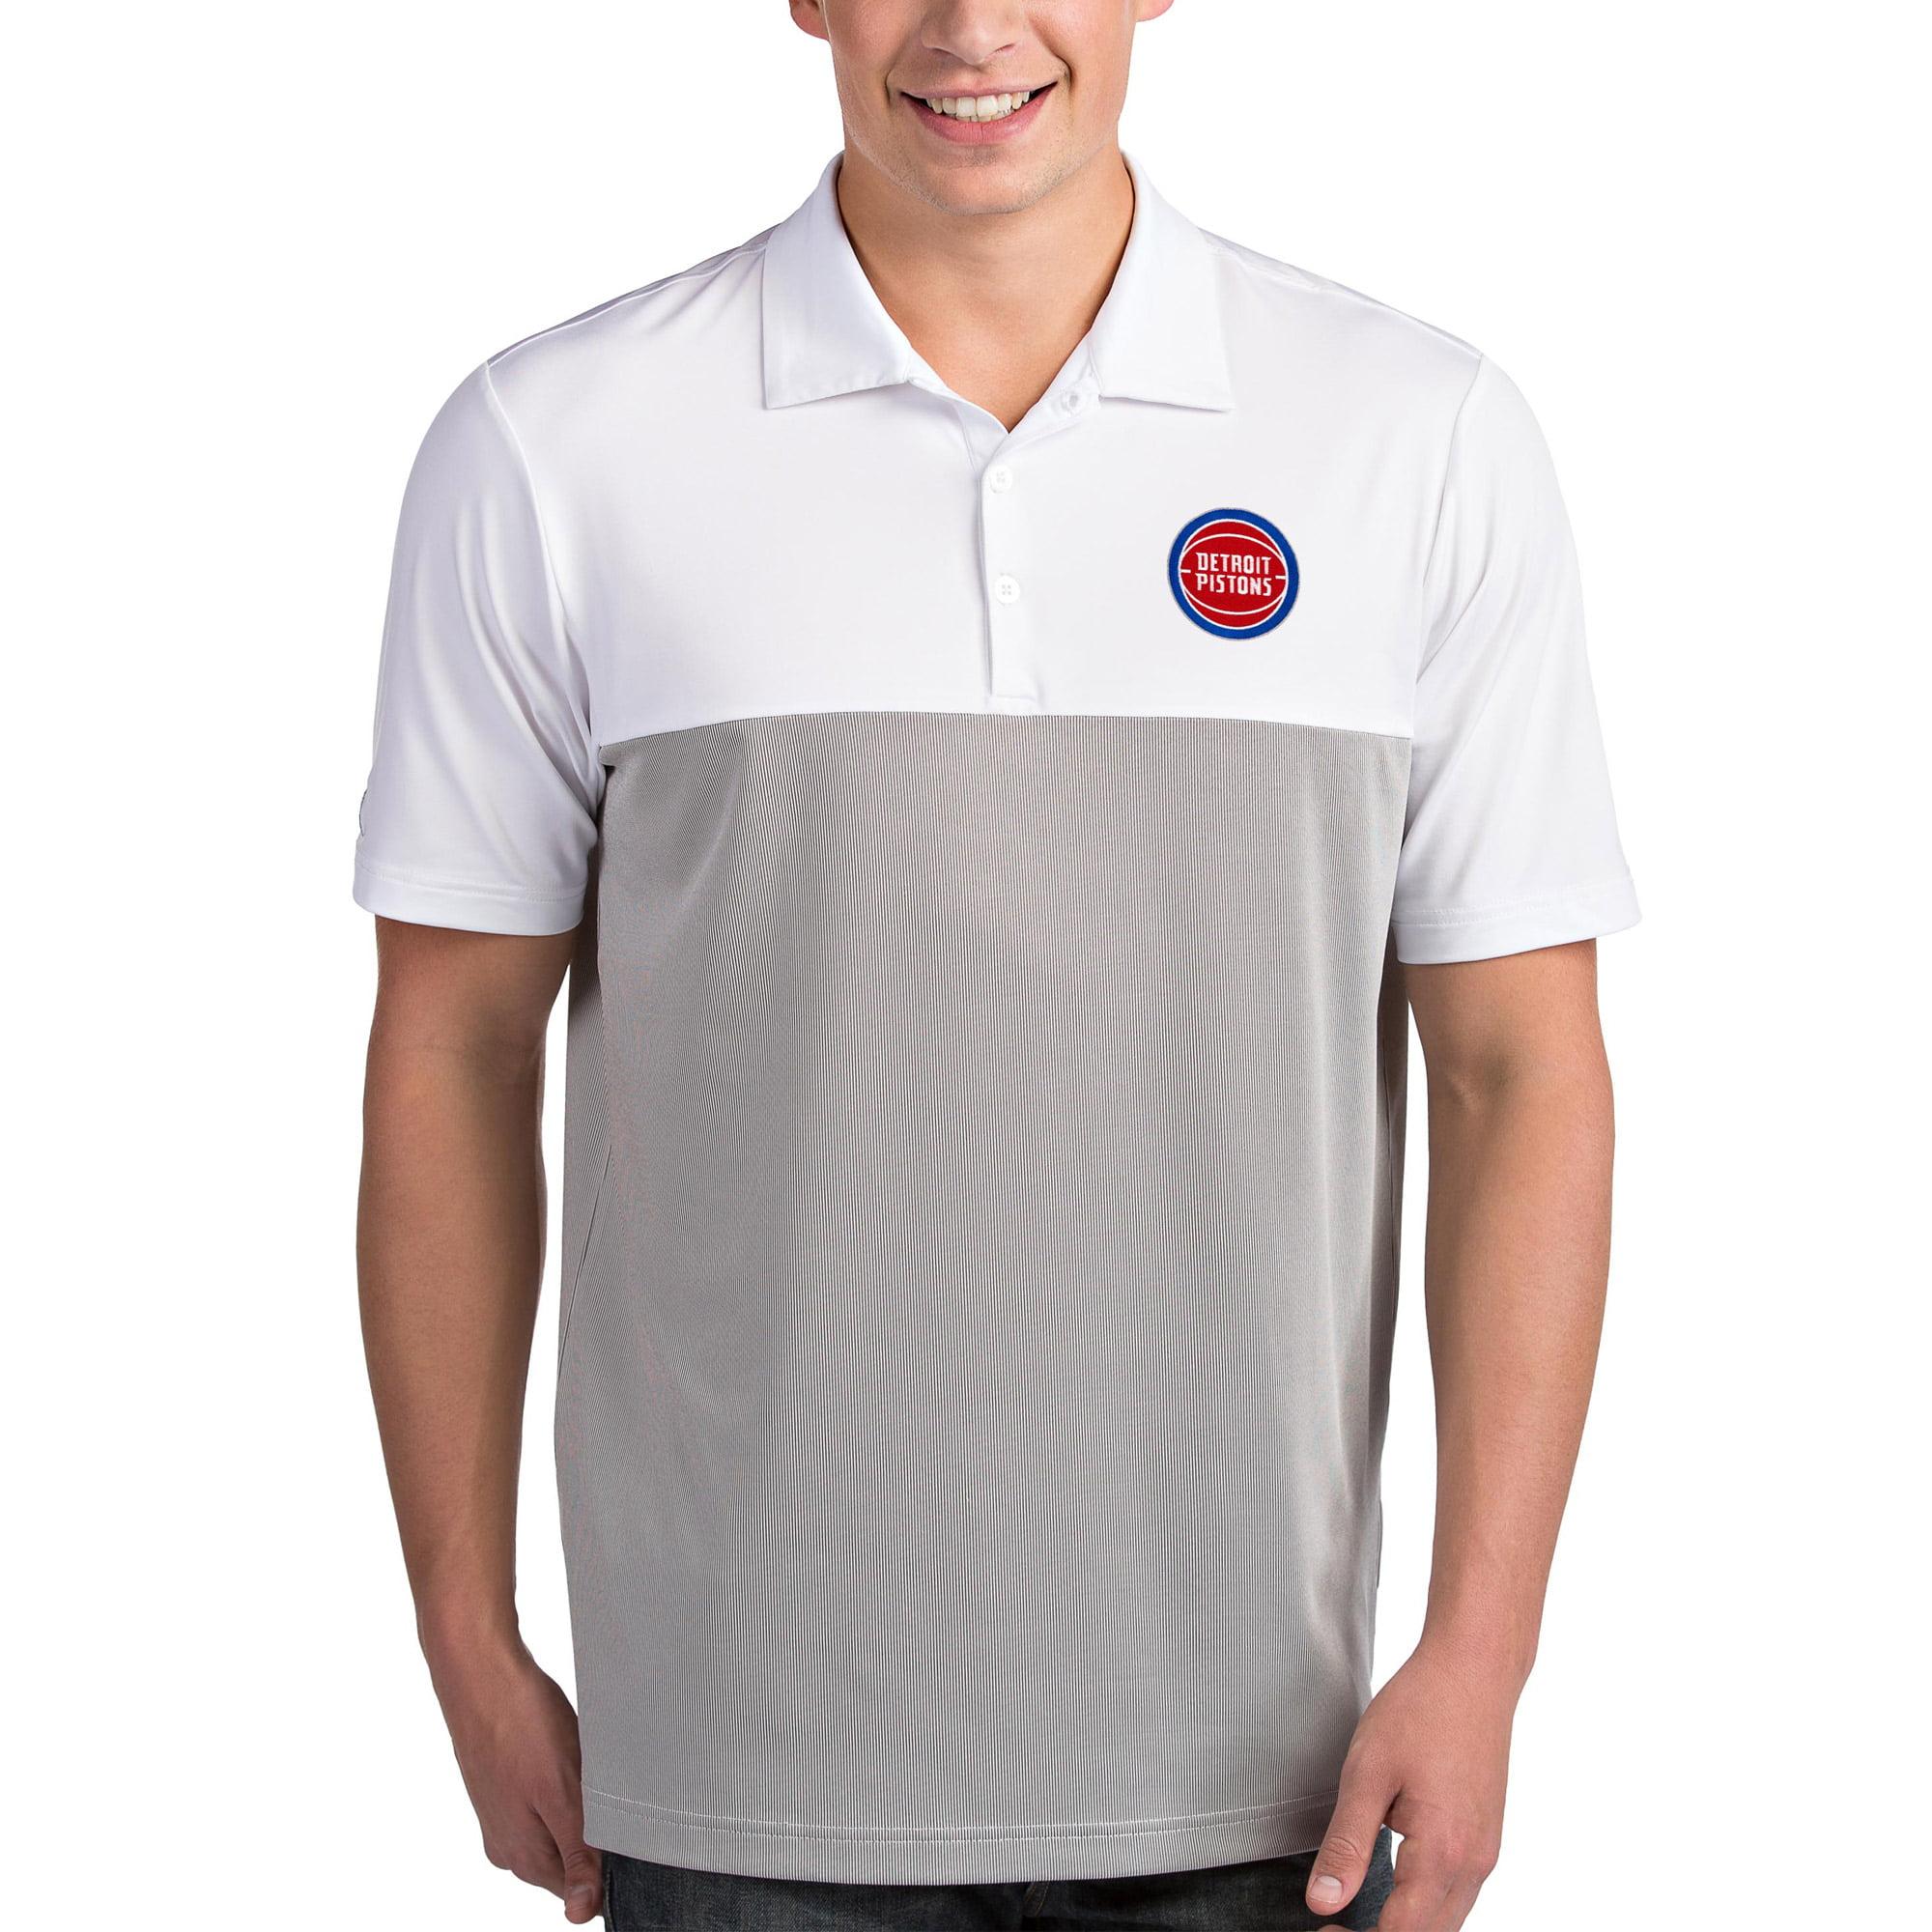 Detroit Pistons Antigua Venture Polo - White/Gray